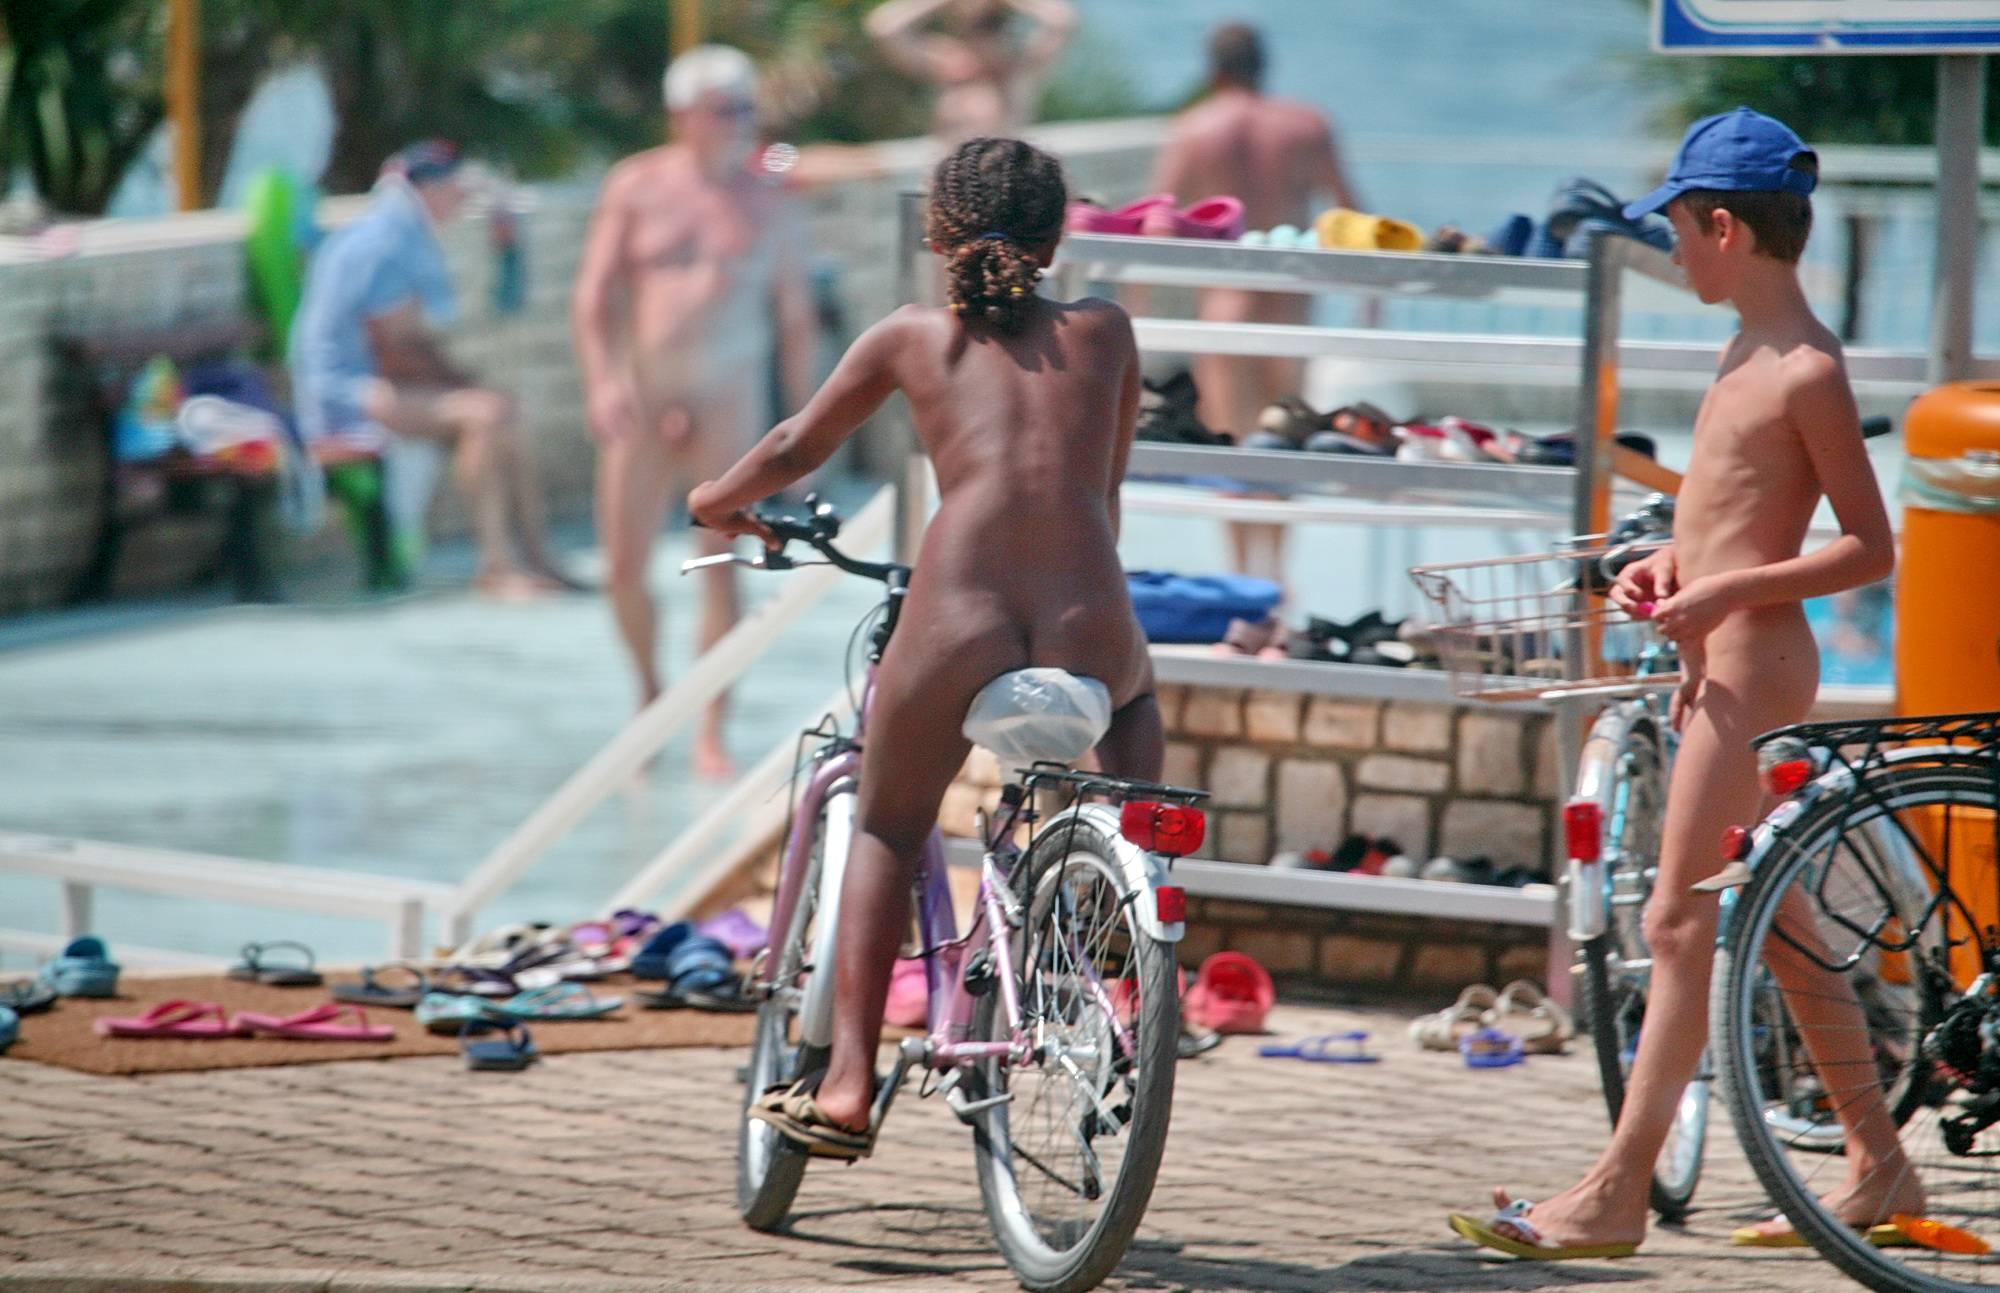 Biking Stand Photo Gallery - 2